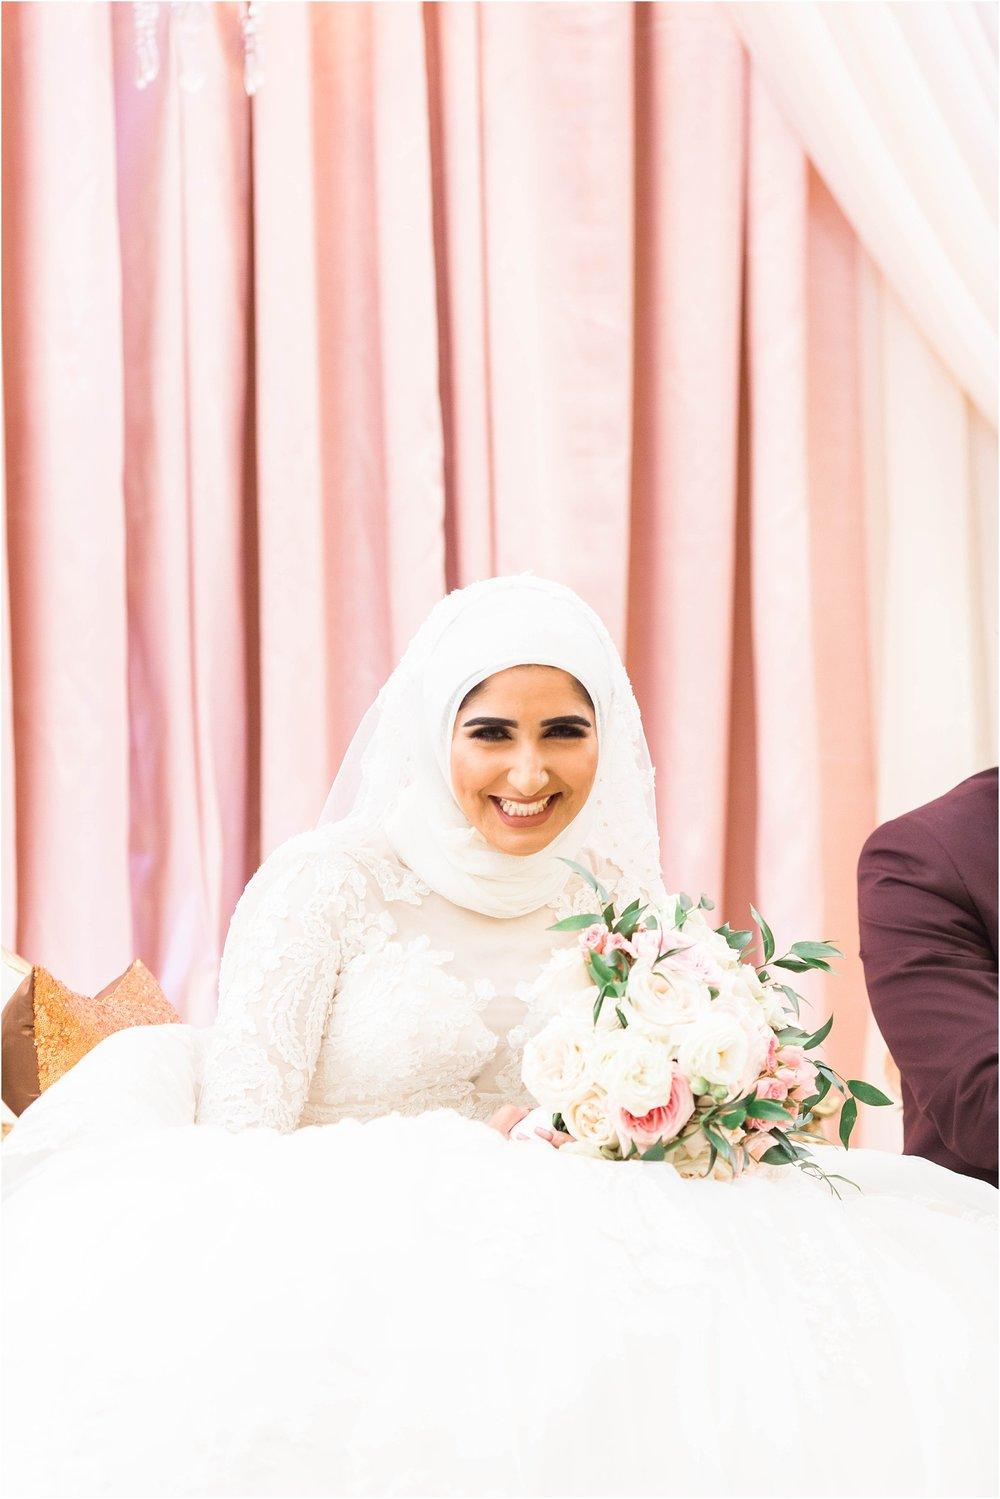 Red-Rose-Convention-Mint-Room-Wedding-Toronto-Mississauga-Brampton-Scarborough-GTA-Pakistani-Indian-Wedding-Engagement-Photographer-Photography_0134.jpg